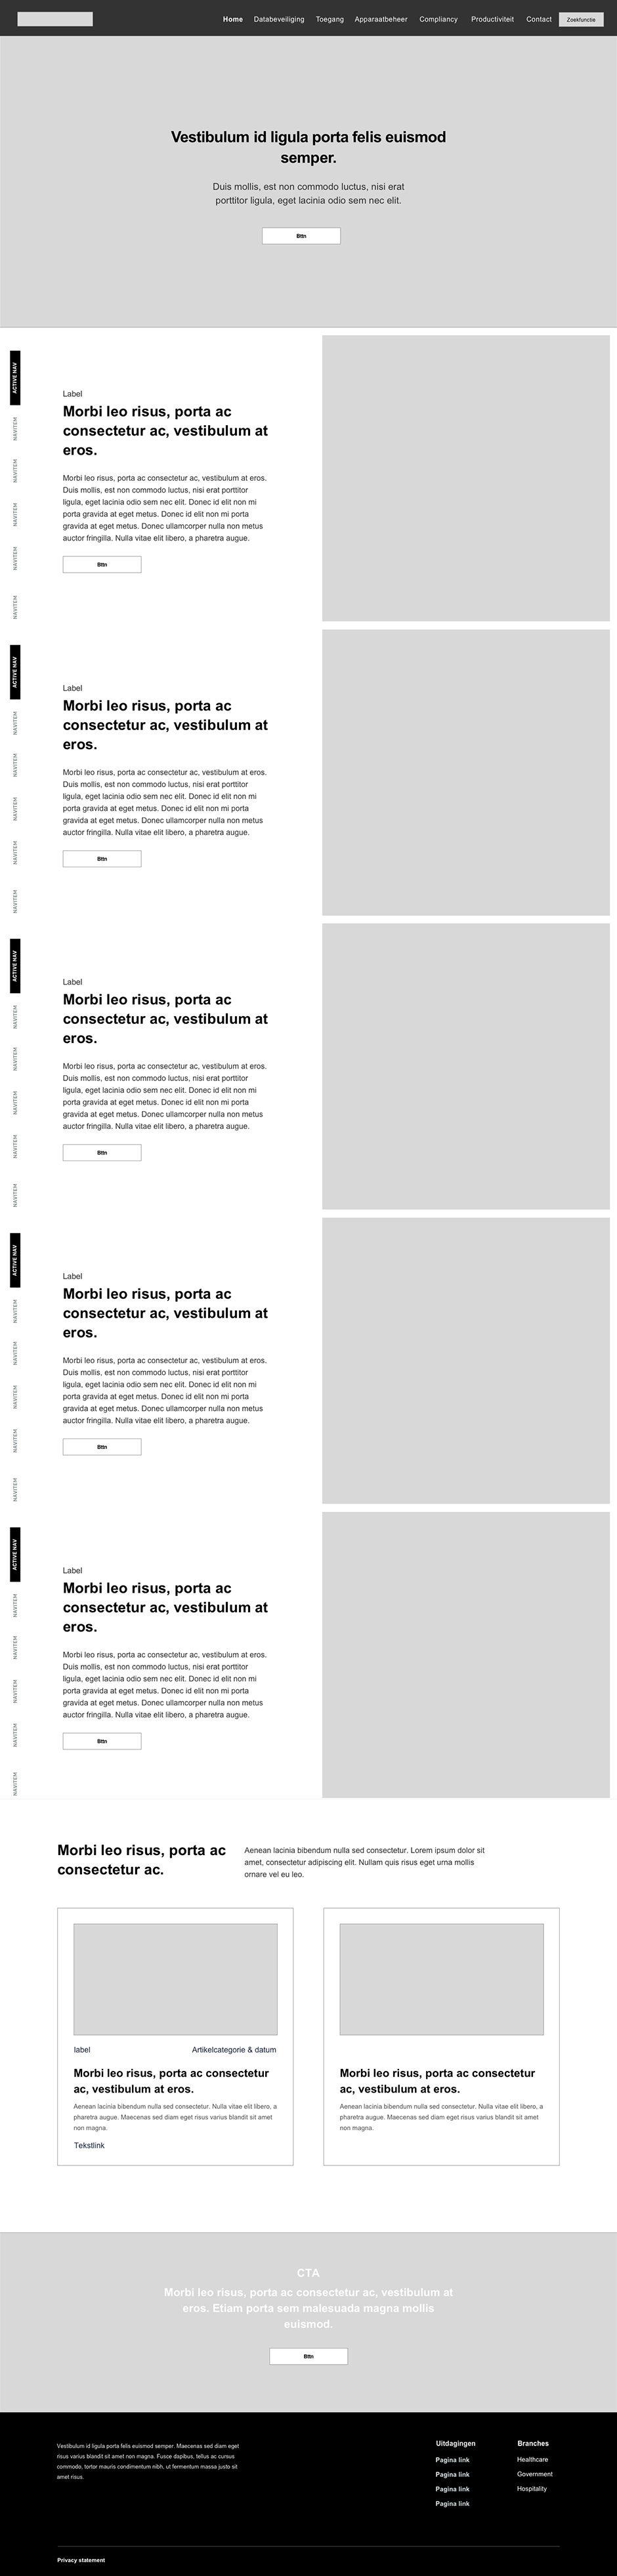 Wireframe-Apple-website